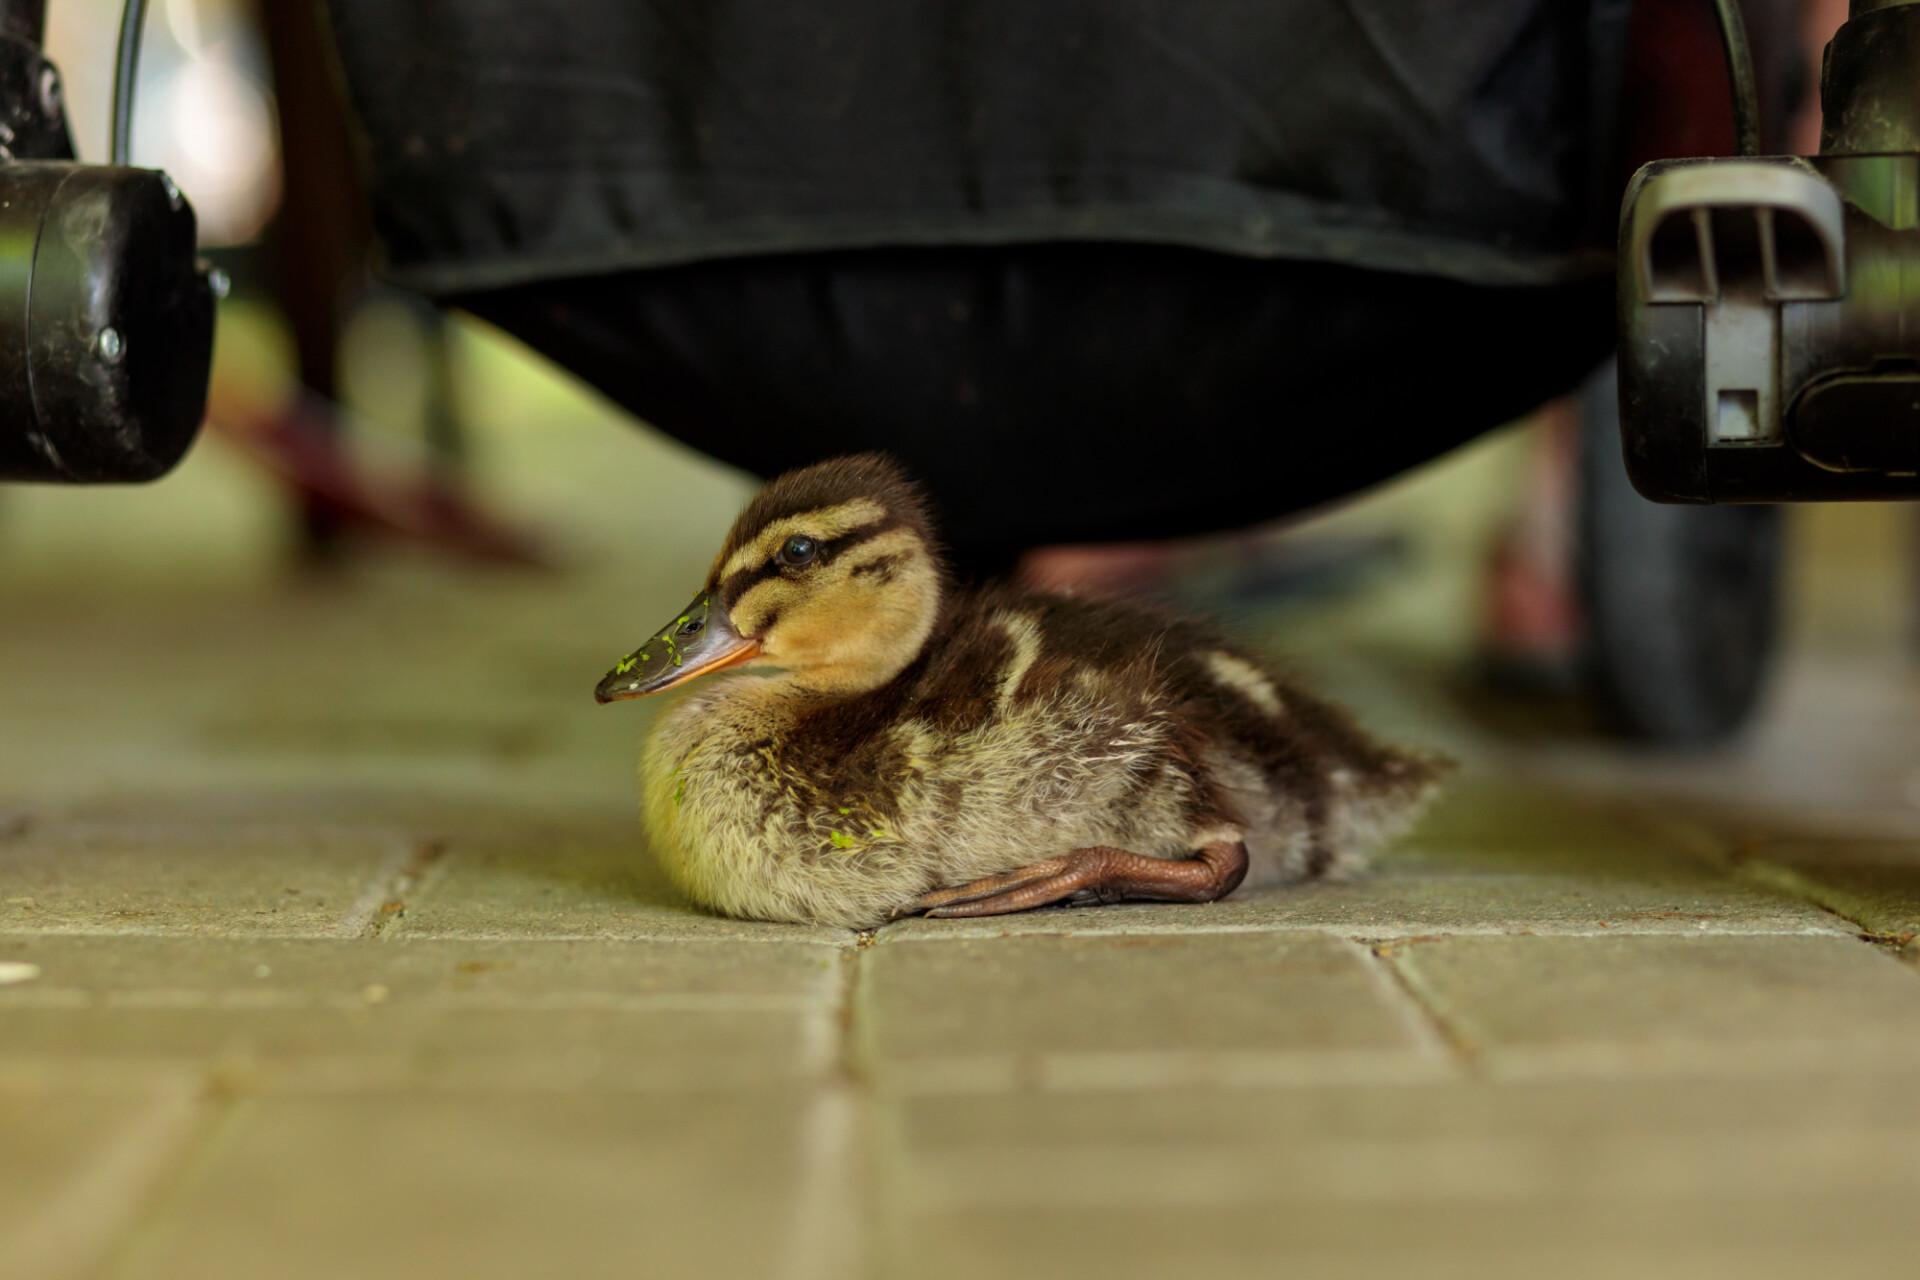 Cute little duckling sitting under a pram